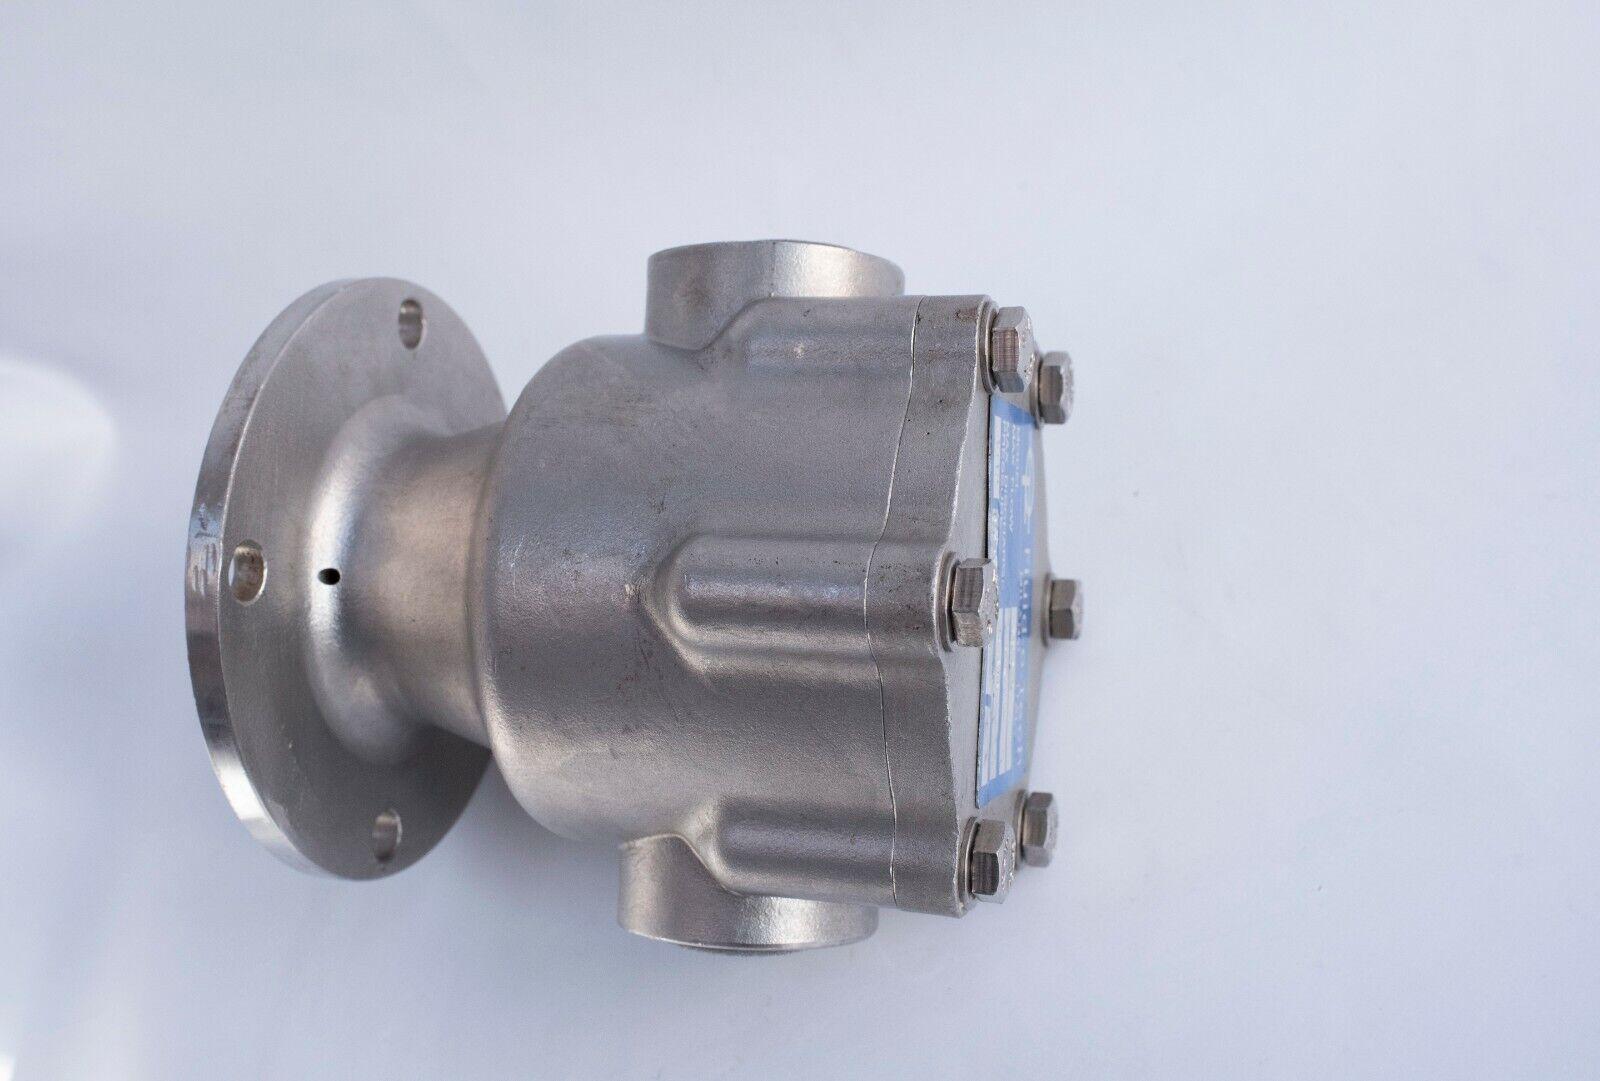 Rotoflow PO4040 Rotary Vane Pump 1400LPH 20Bar High Pressure Reverse Osmosis